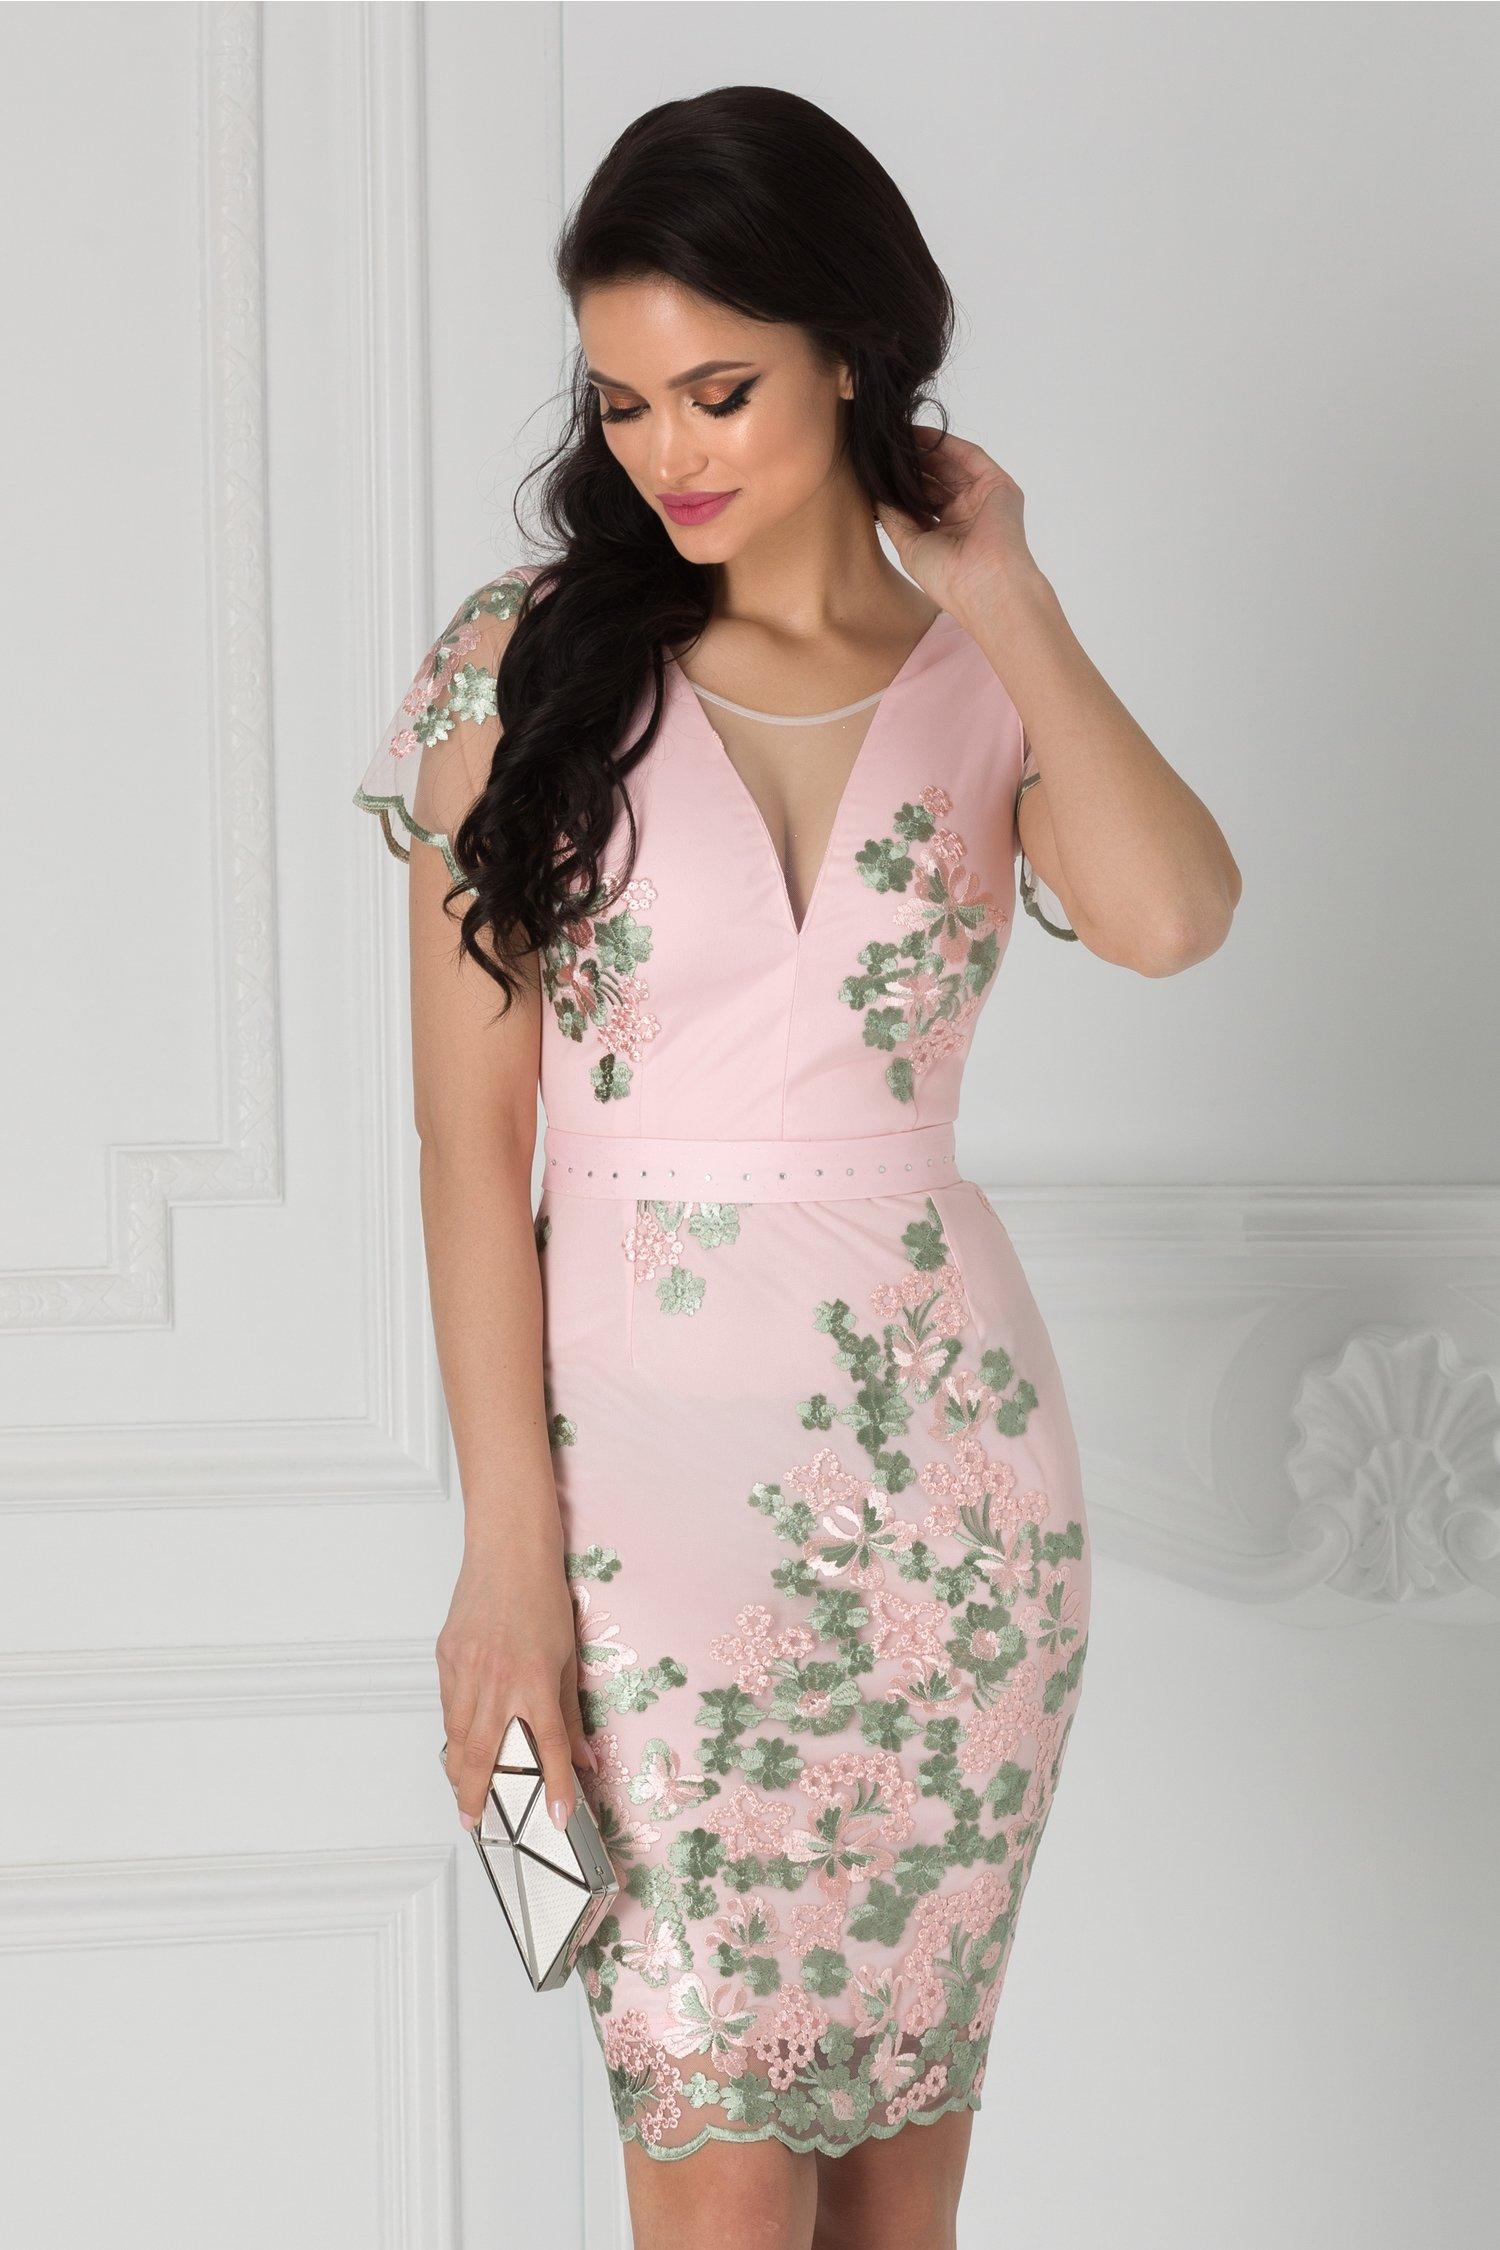 Rochie Anelie roz cu broderie florala si cordon in talie